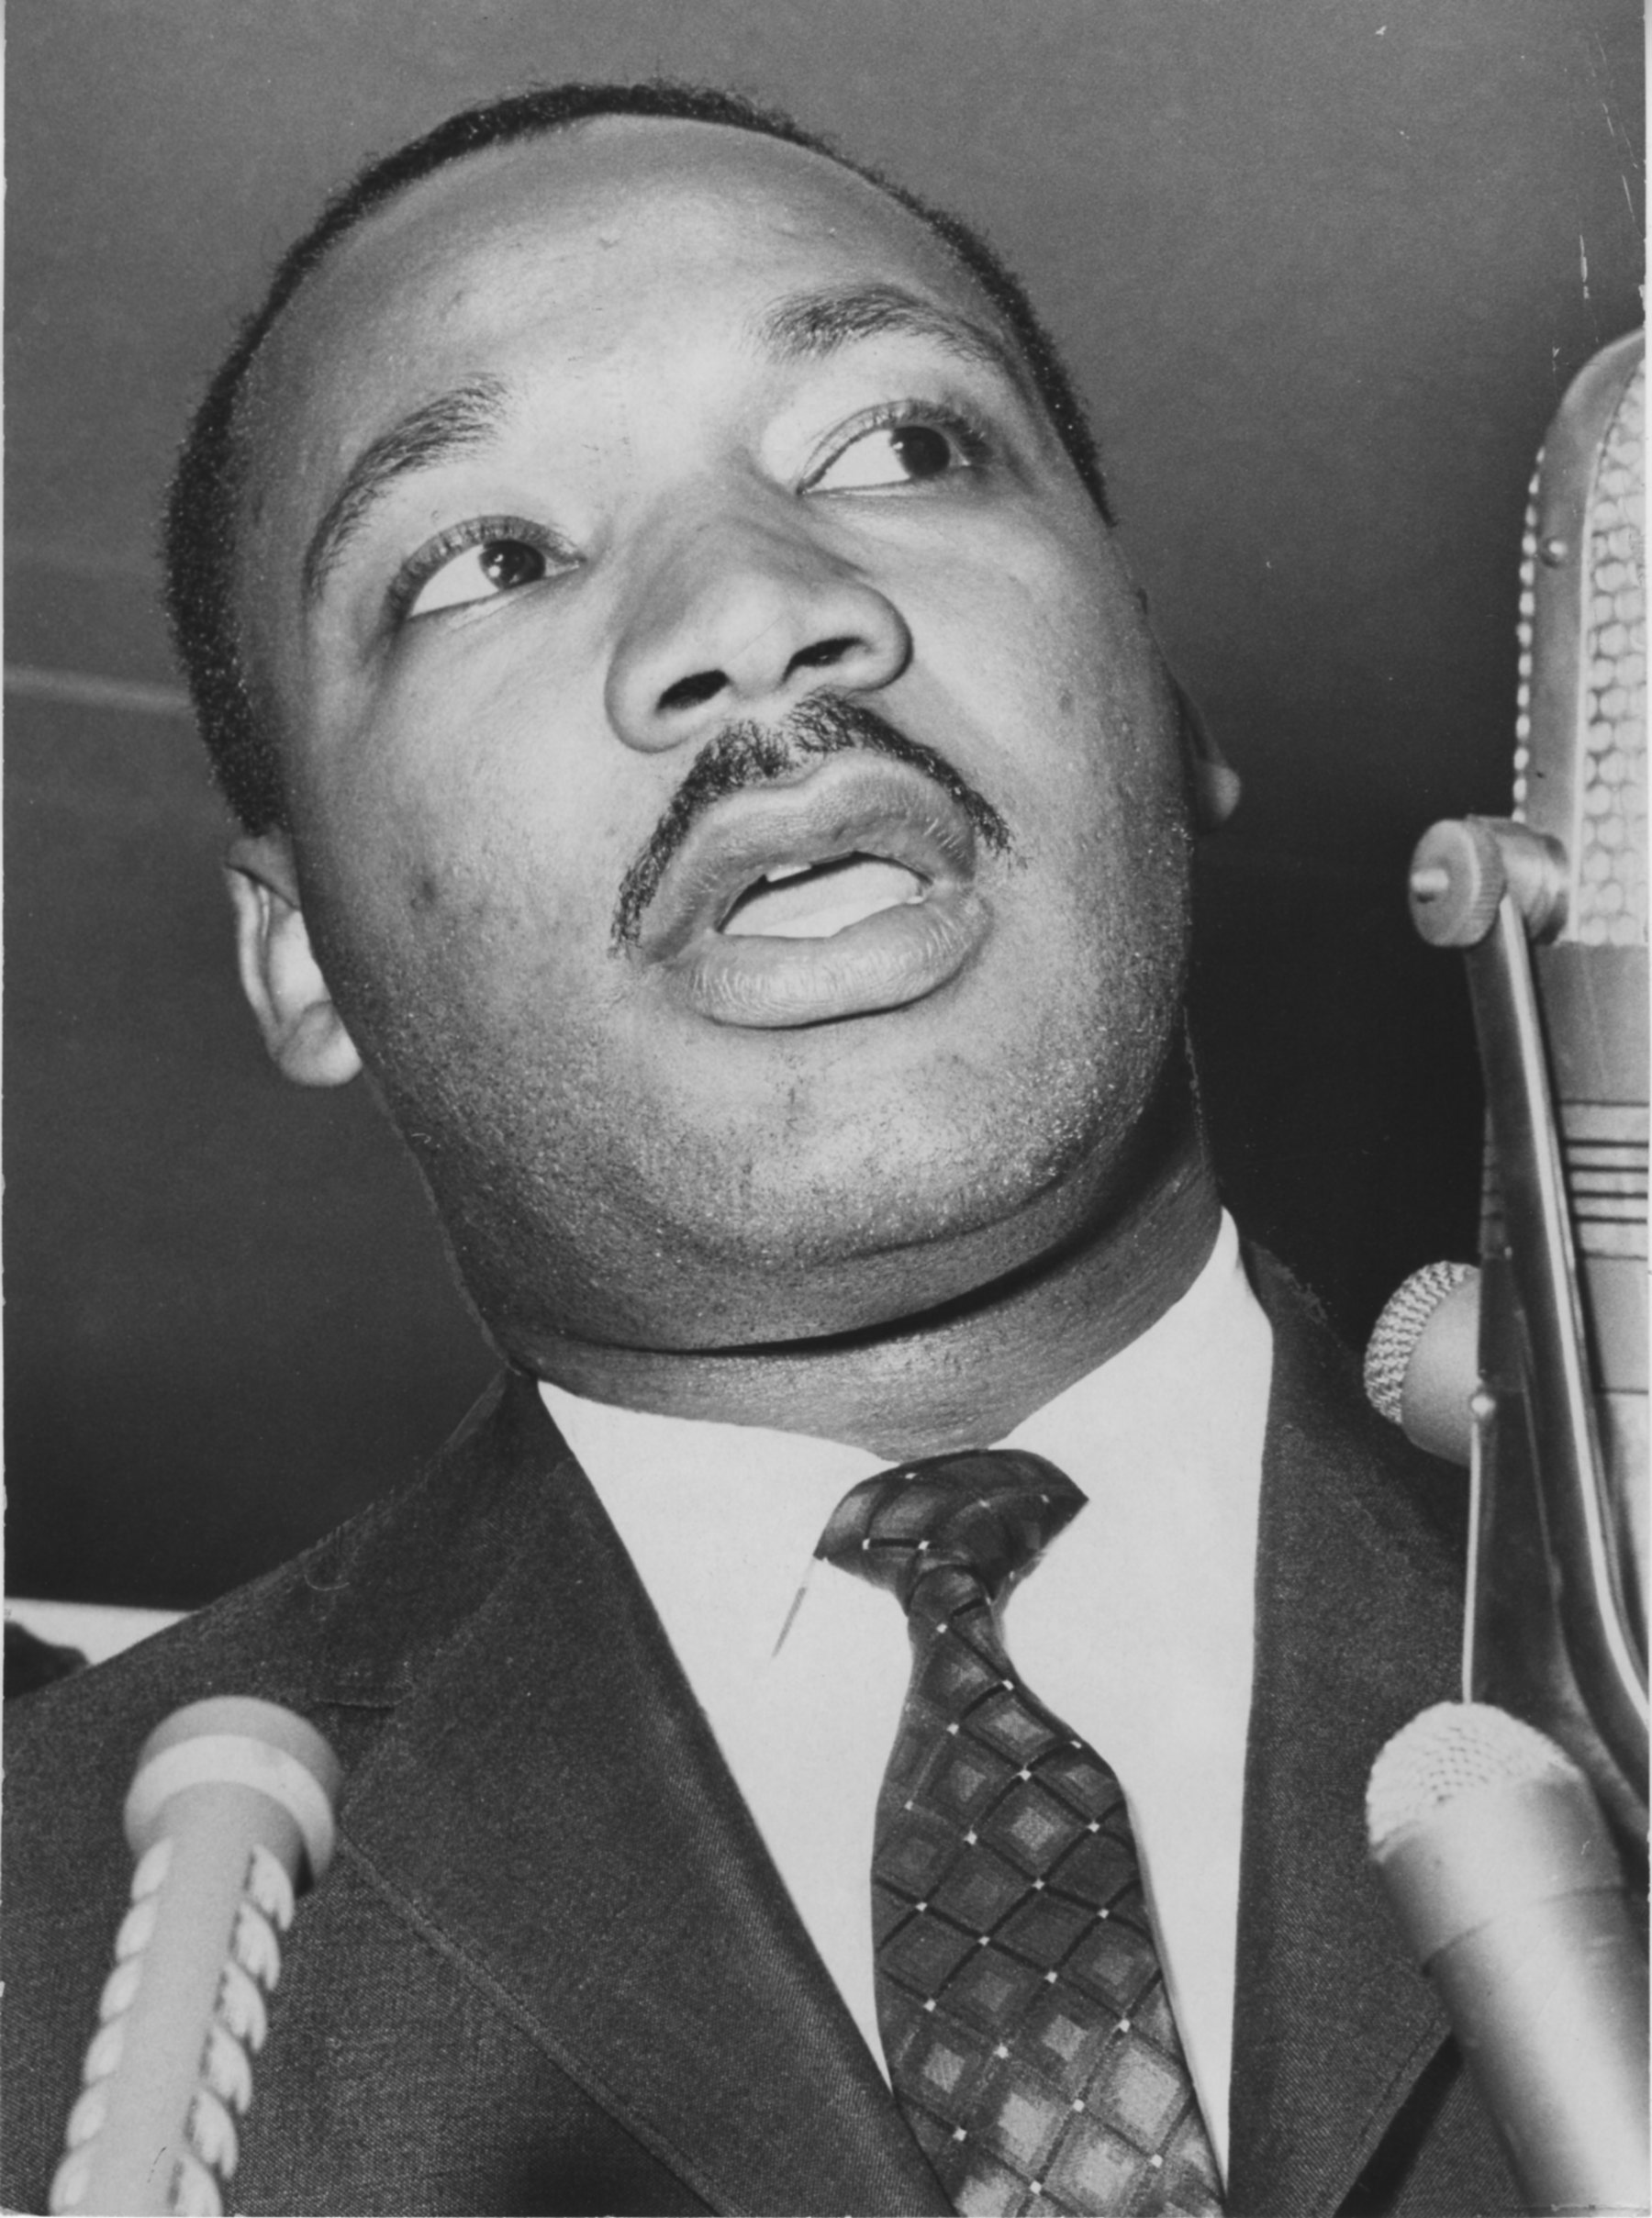 San Francisco, CA July 4, 1964 - Dr. Martin Luther King Jr. meets the press at San Francisco Airport.(Jim Edelen / Oakland Tribune)